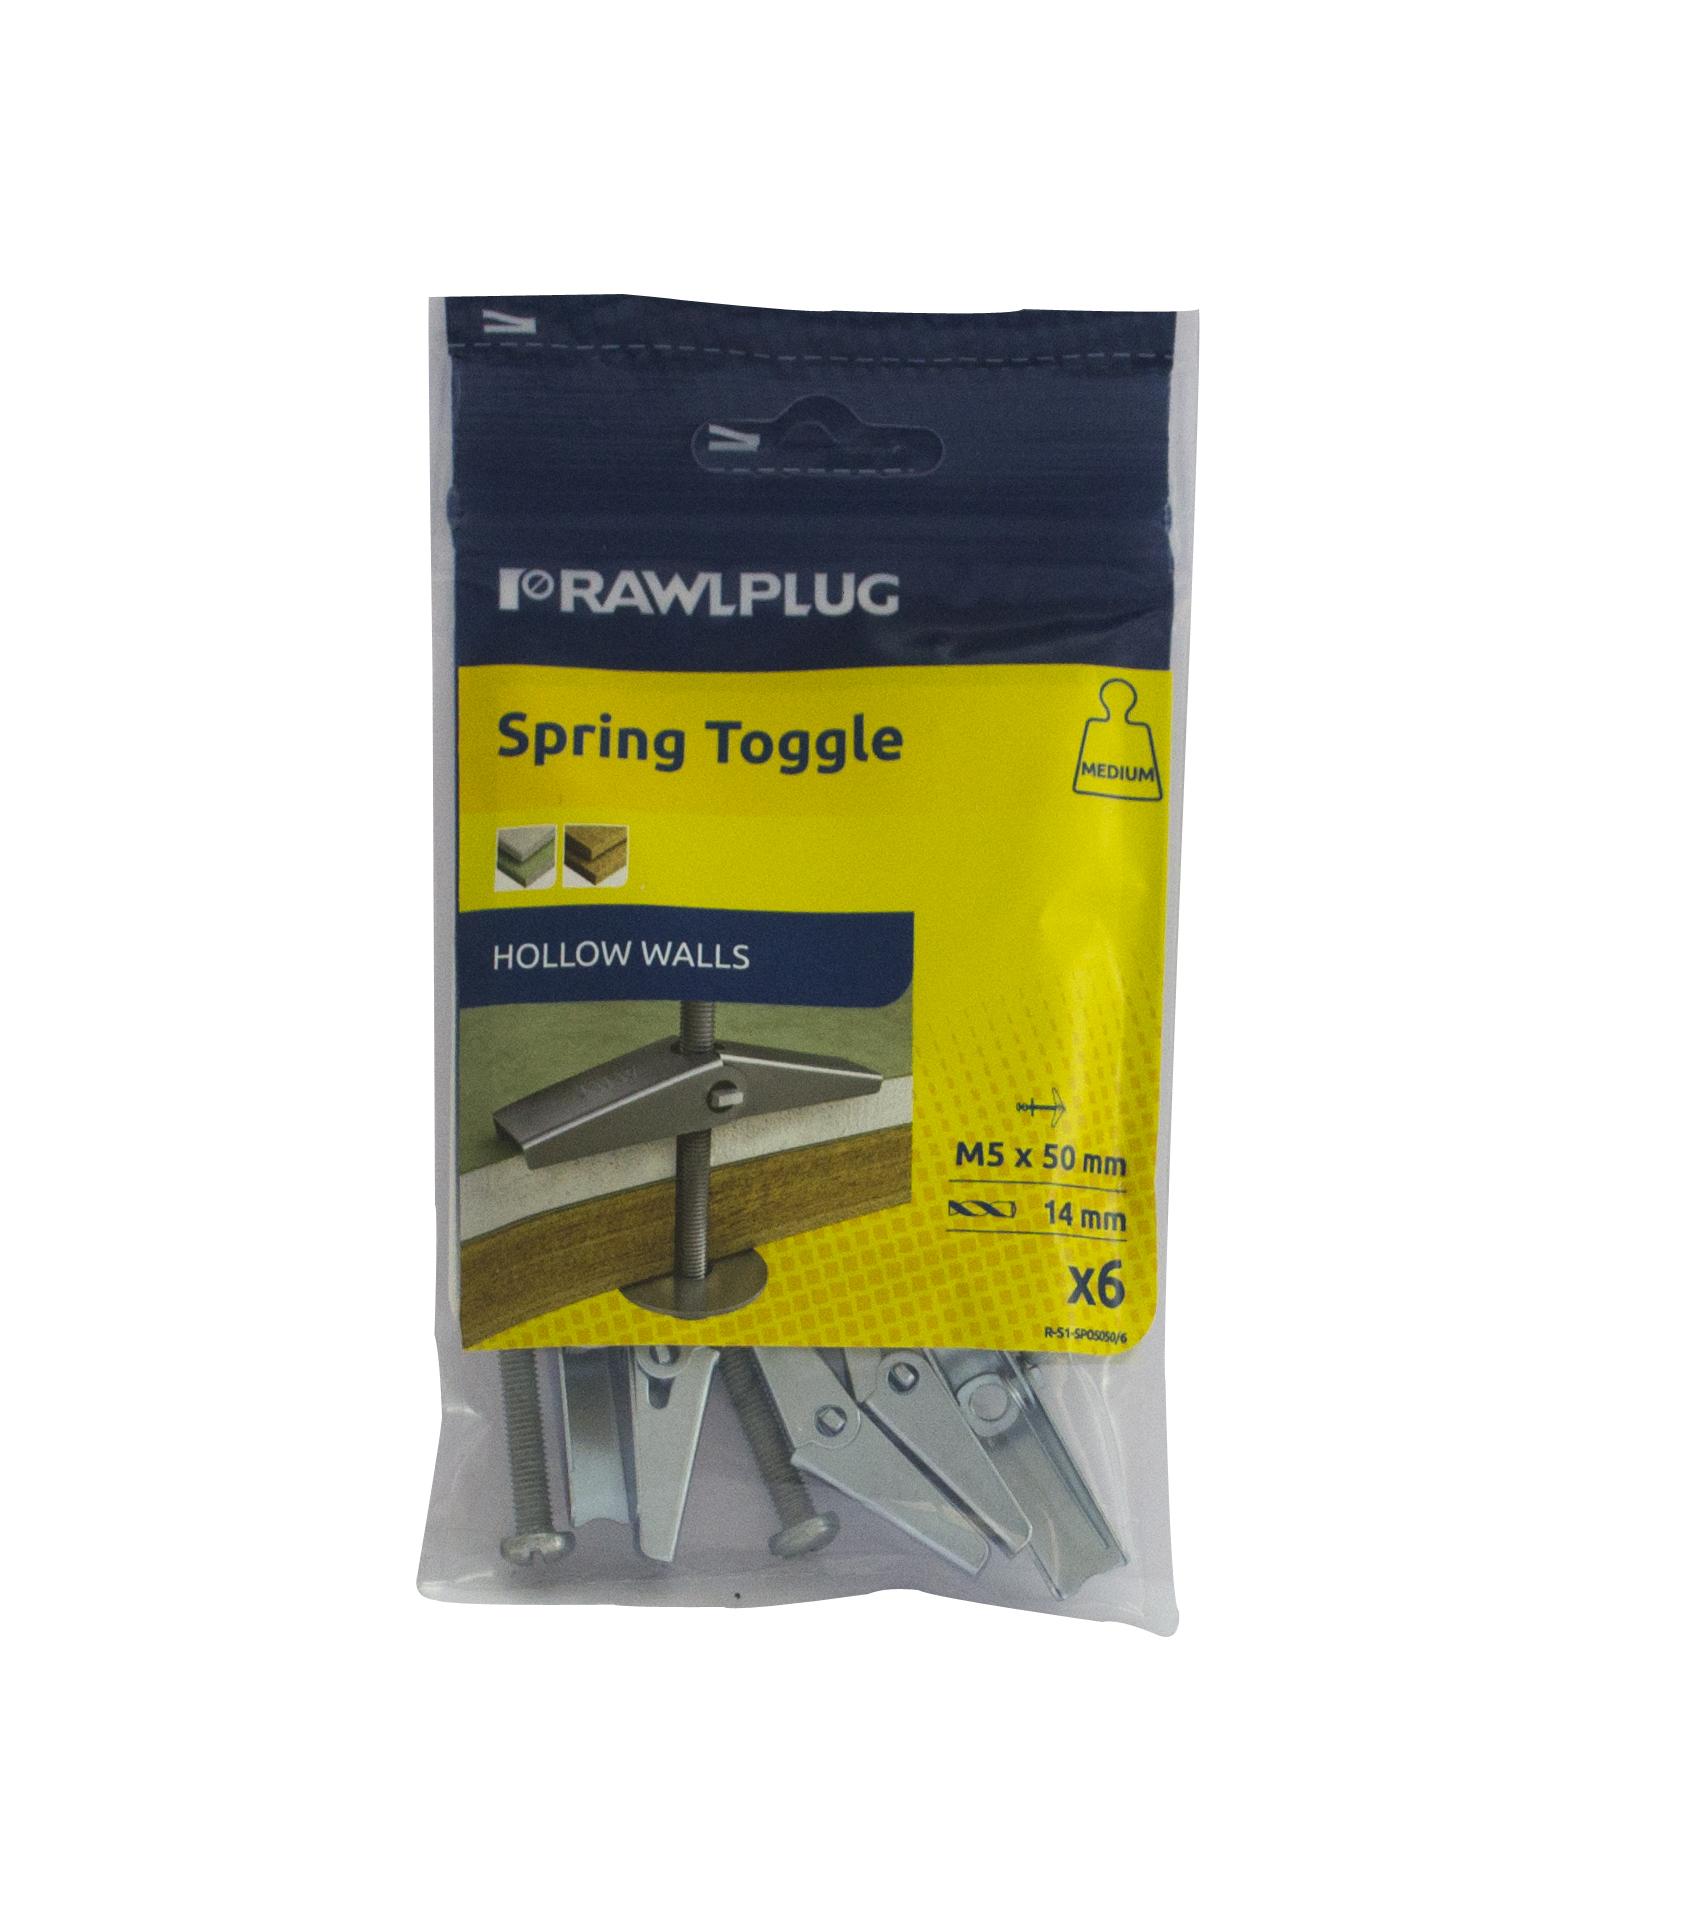 Rawl Trade Spring Toggle M3x50 (6pcs)